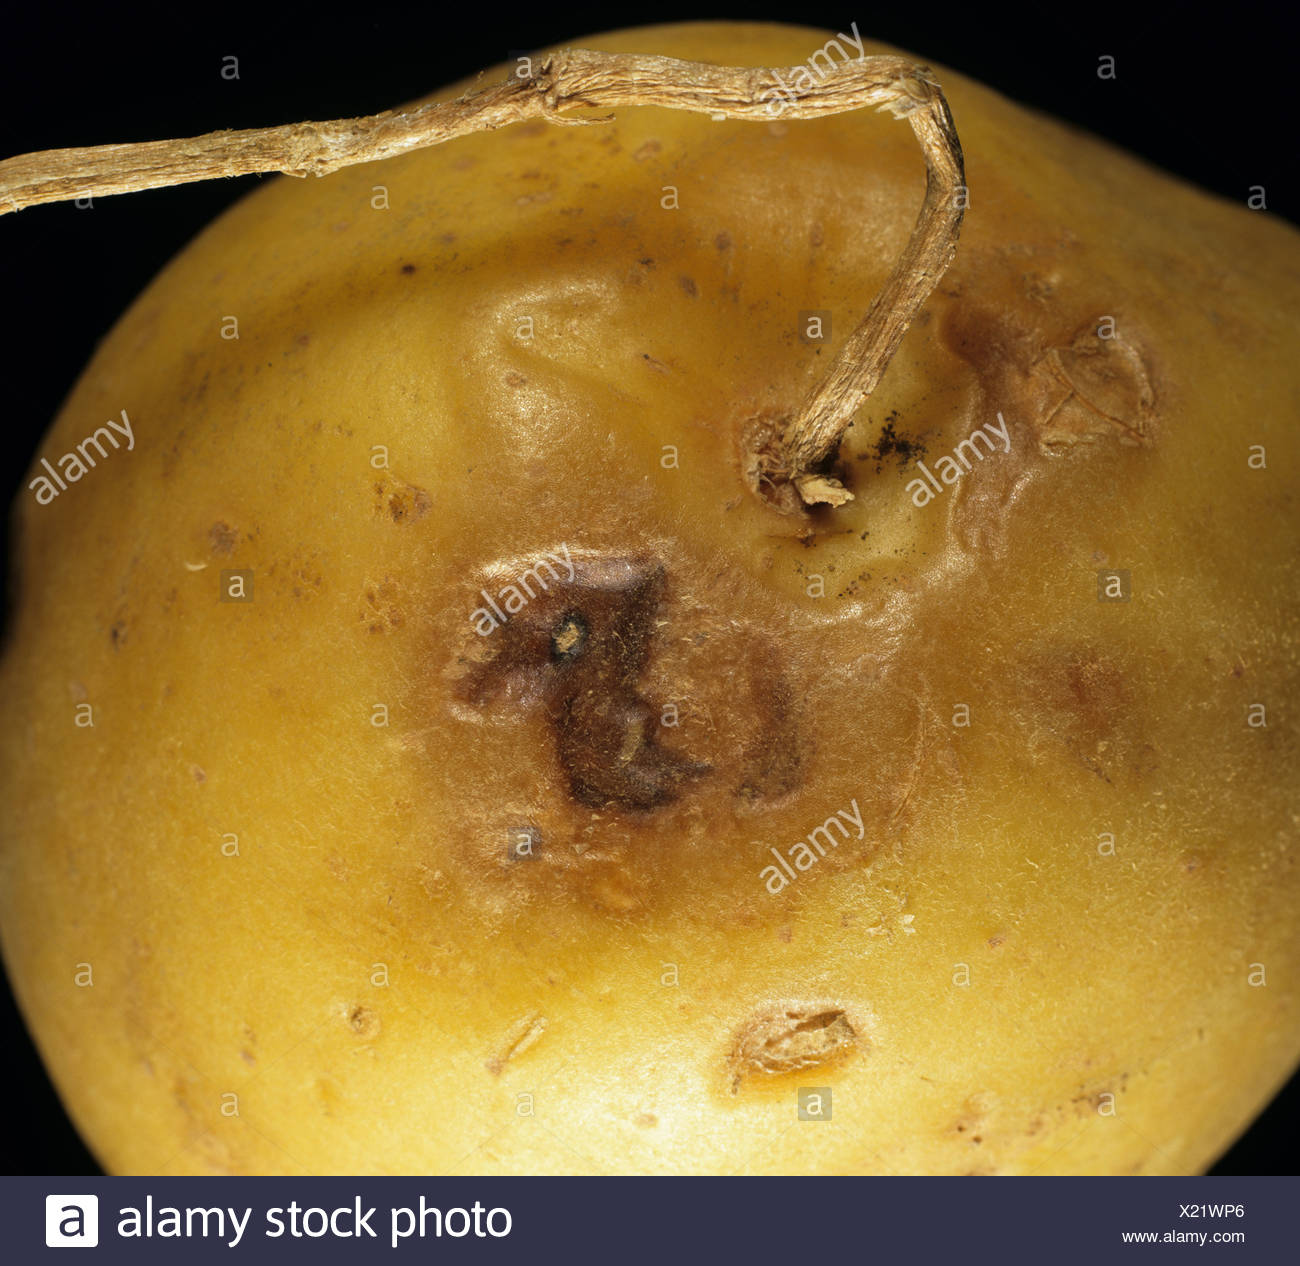 Potato tuber showing lesions of Potato virus Y ntn on stolon end - Stock Image